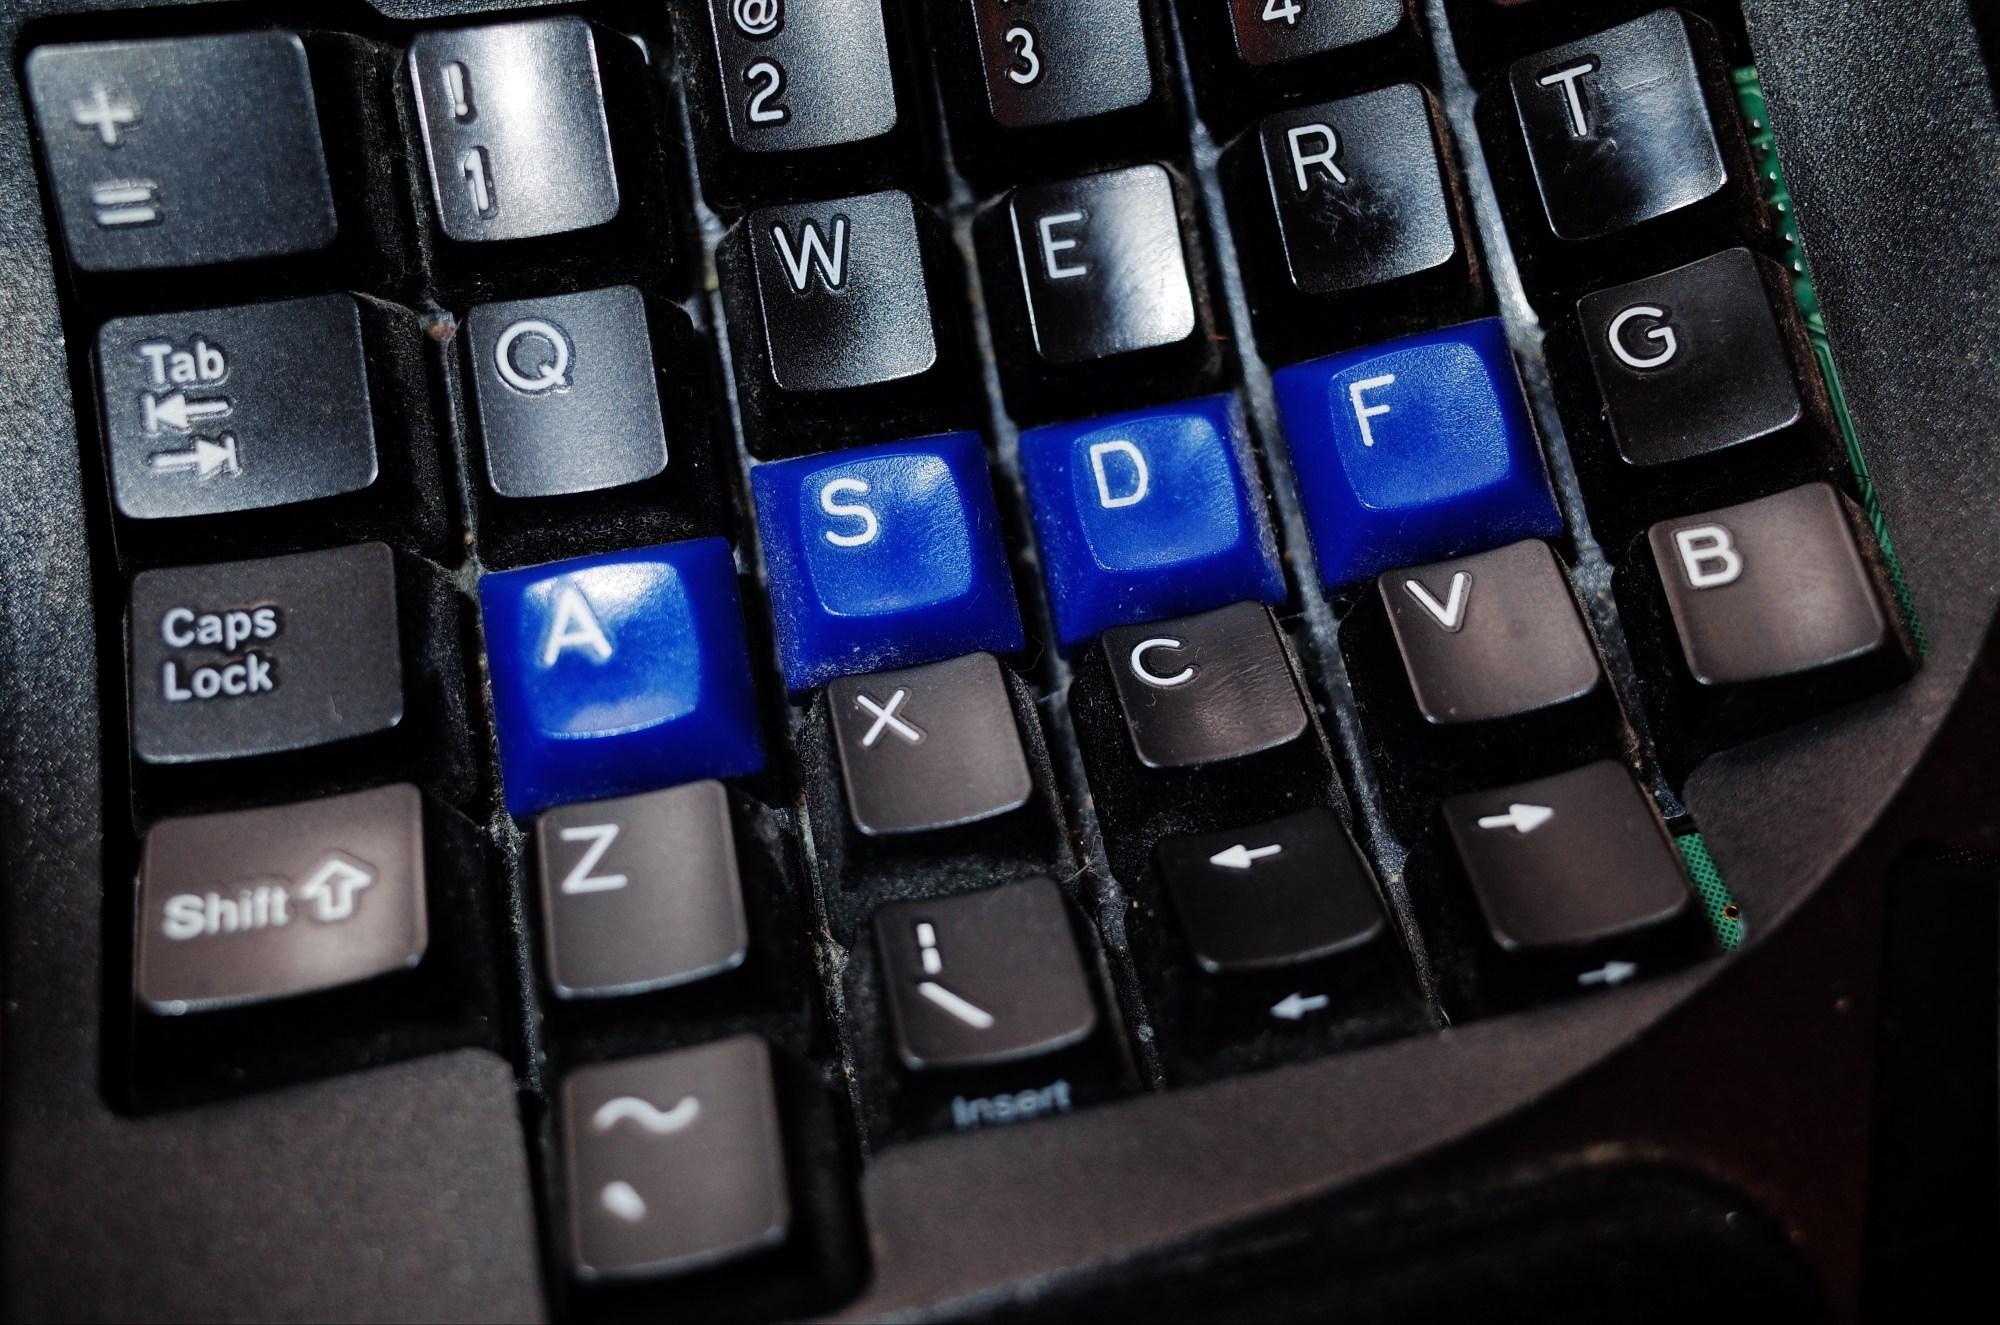 ASDF. Kinesis keyboard. Berlin, 2017 #cindyproject